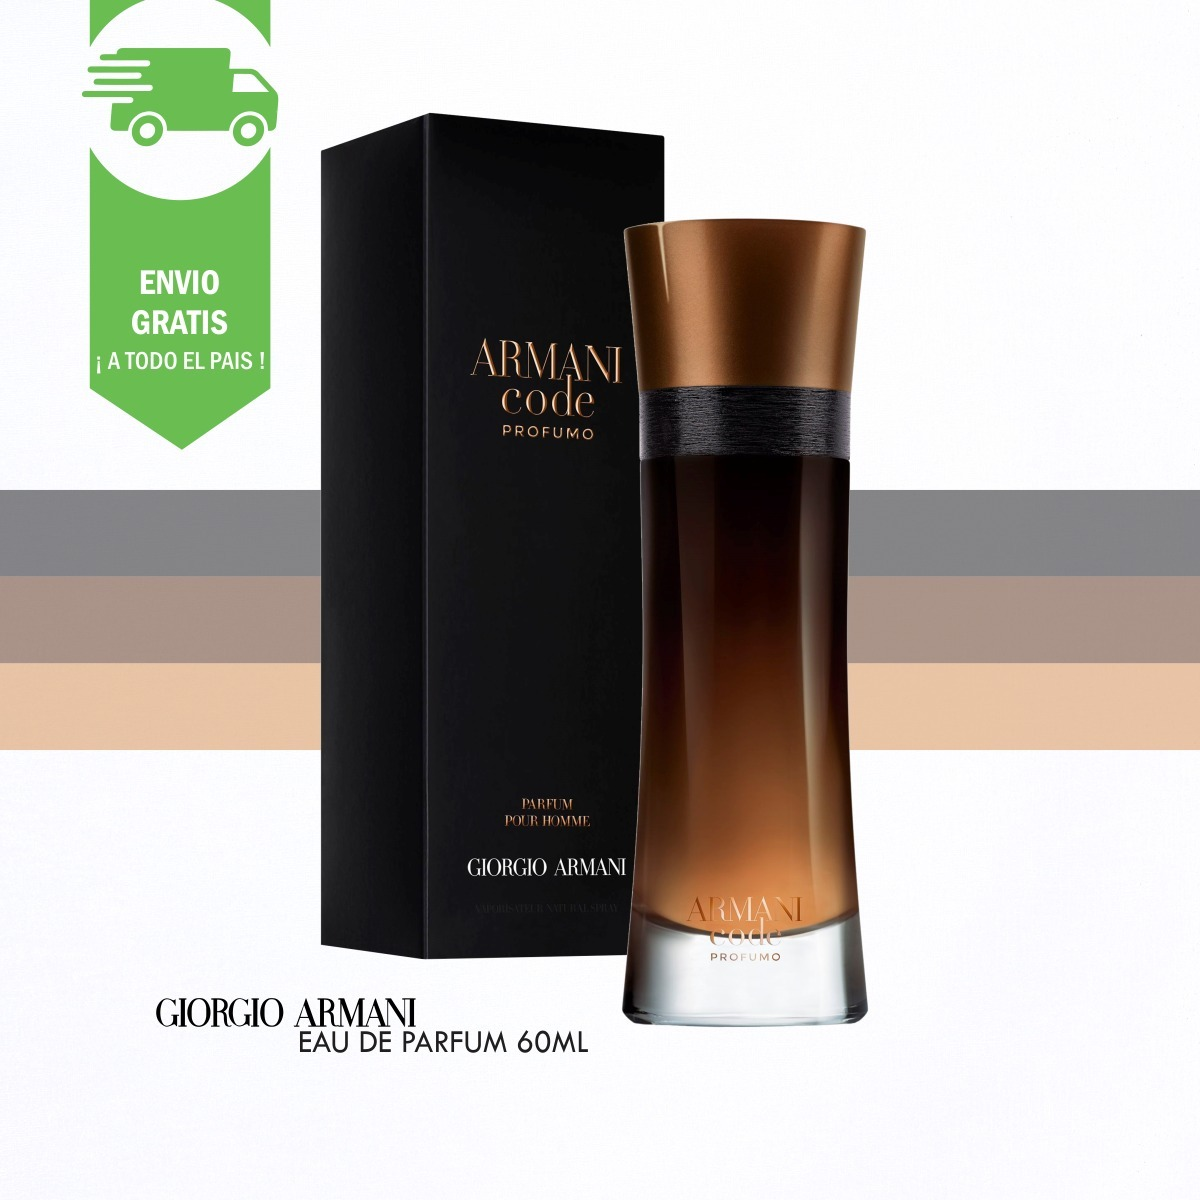 60ml Perfume Code Tester »» 00 Profumo ««2 299 Armani Oficial 35ALc4qRj